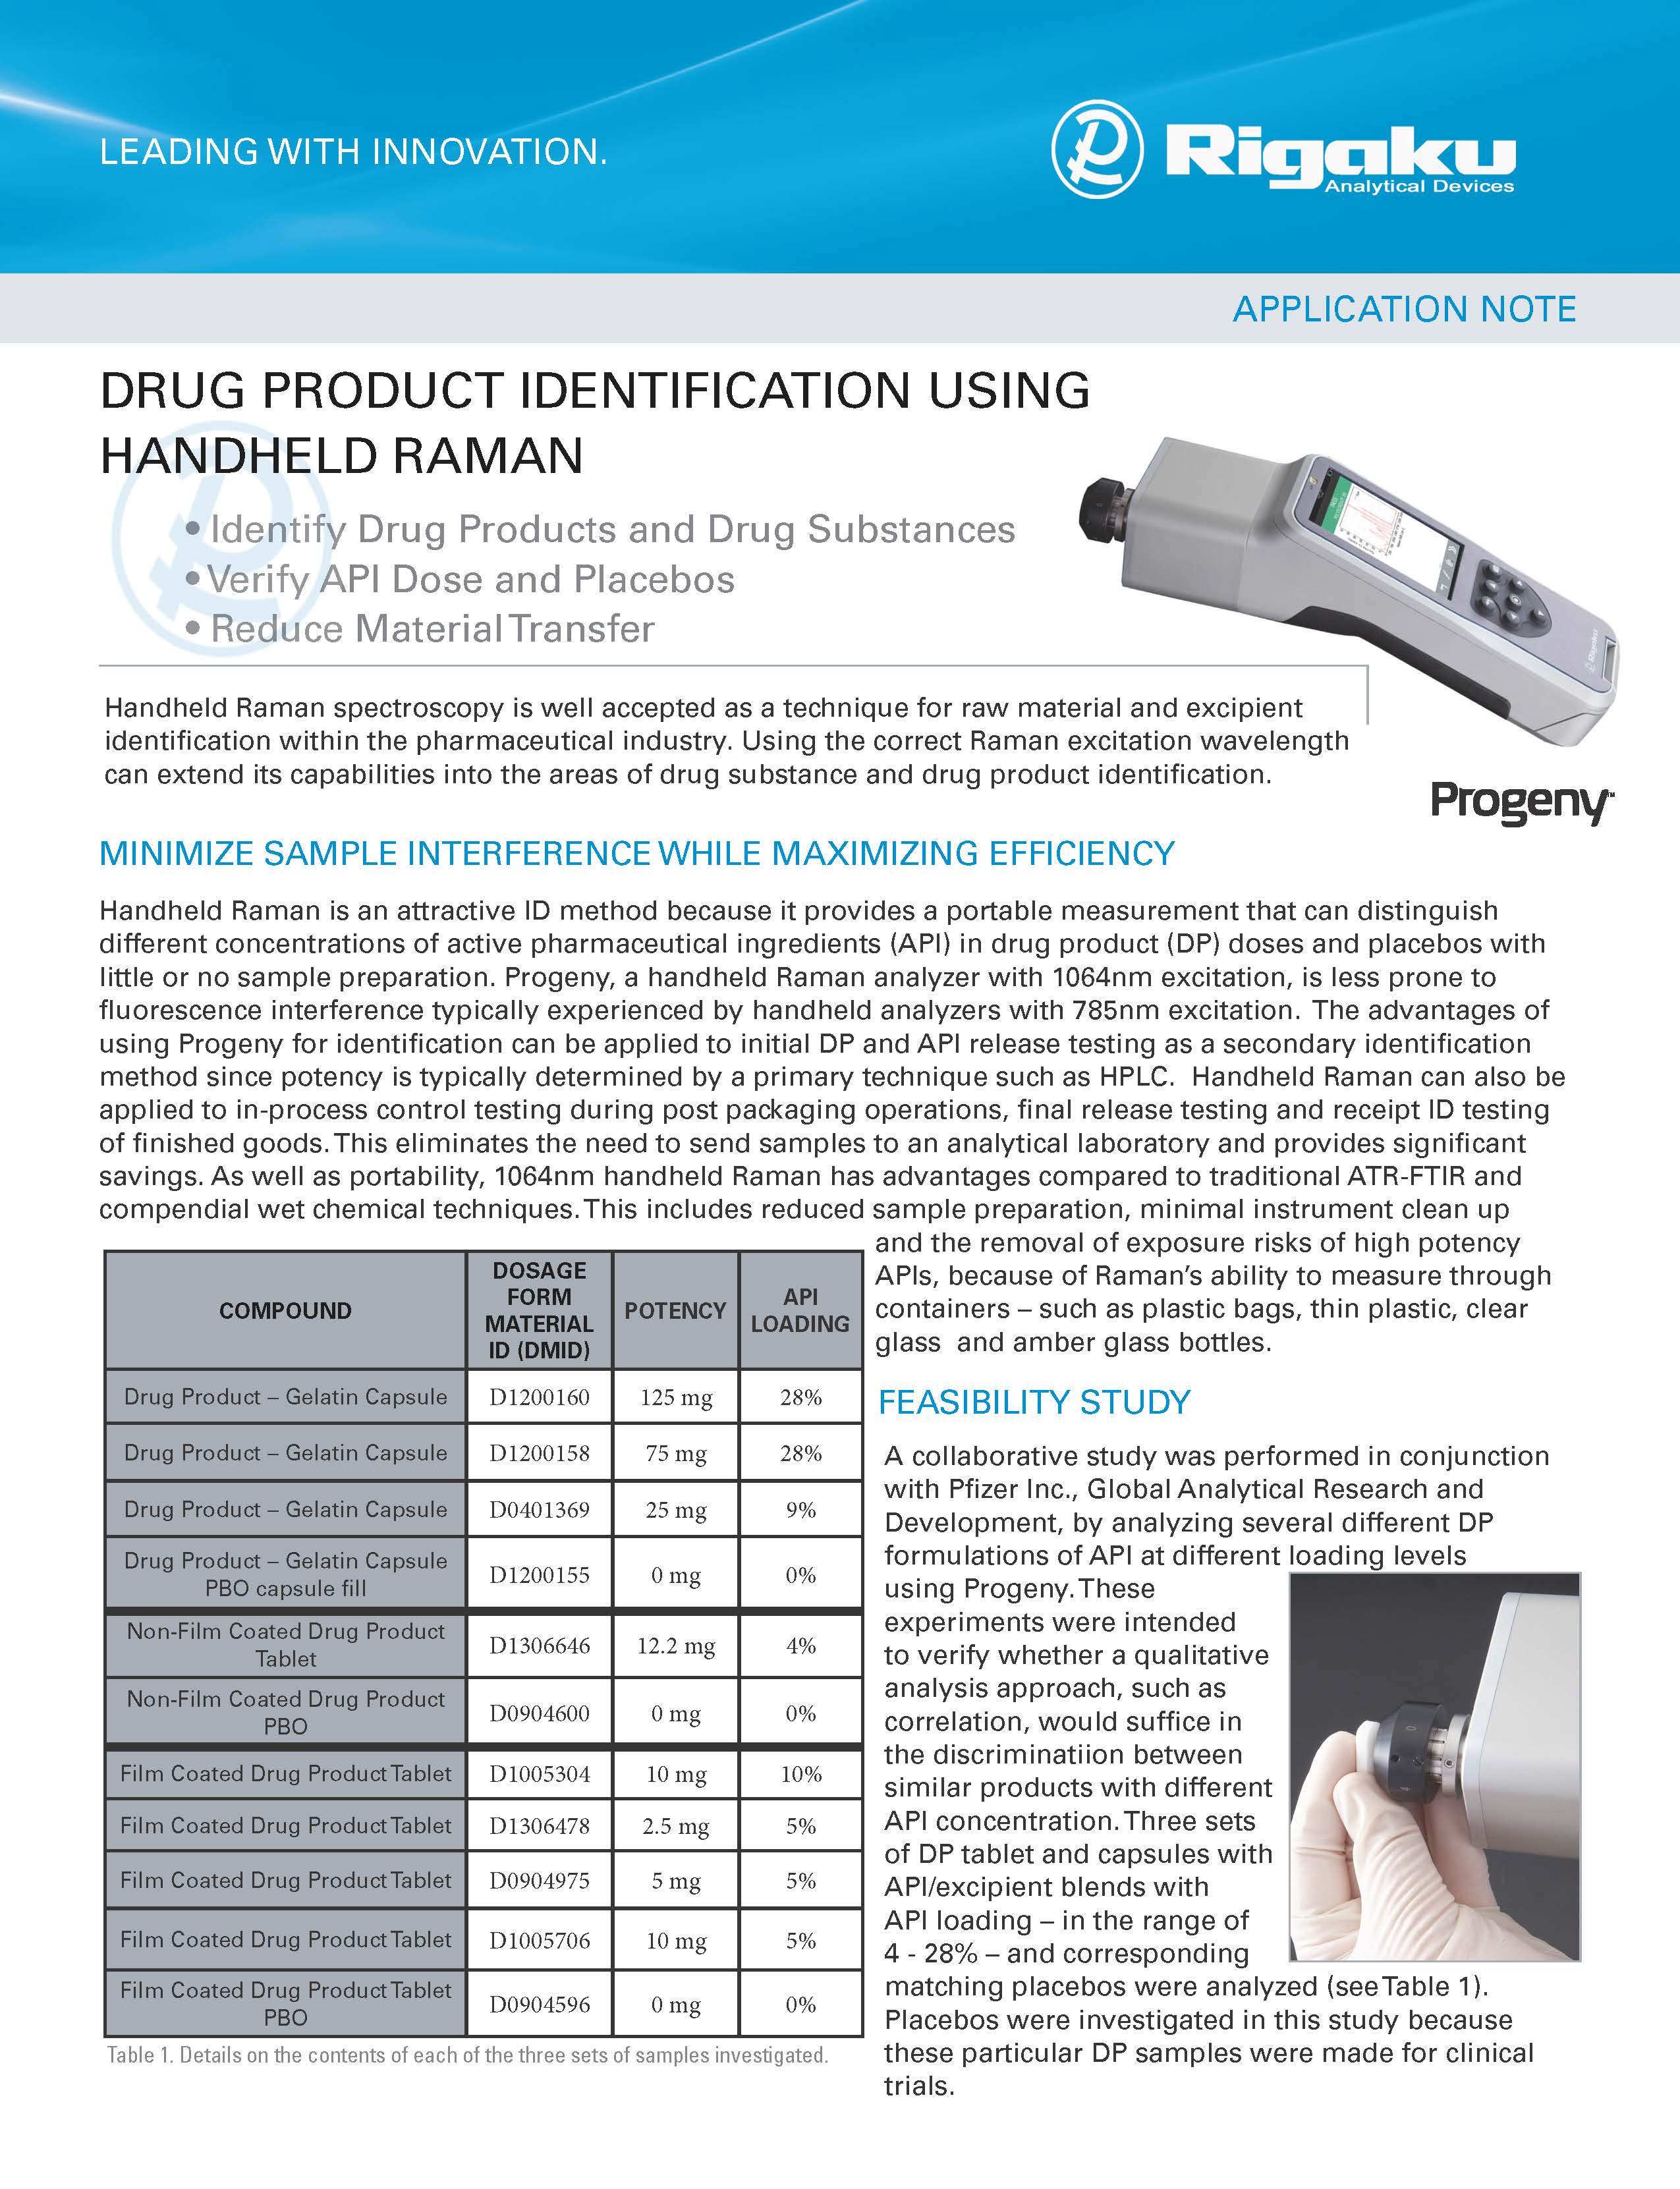 Drug ID App Note 2017June29_Page_1